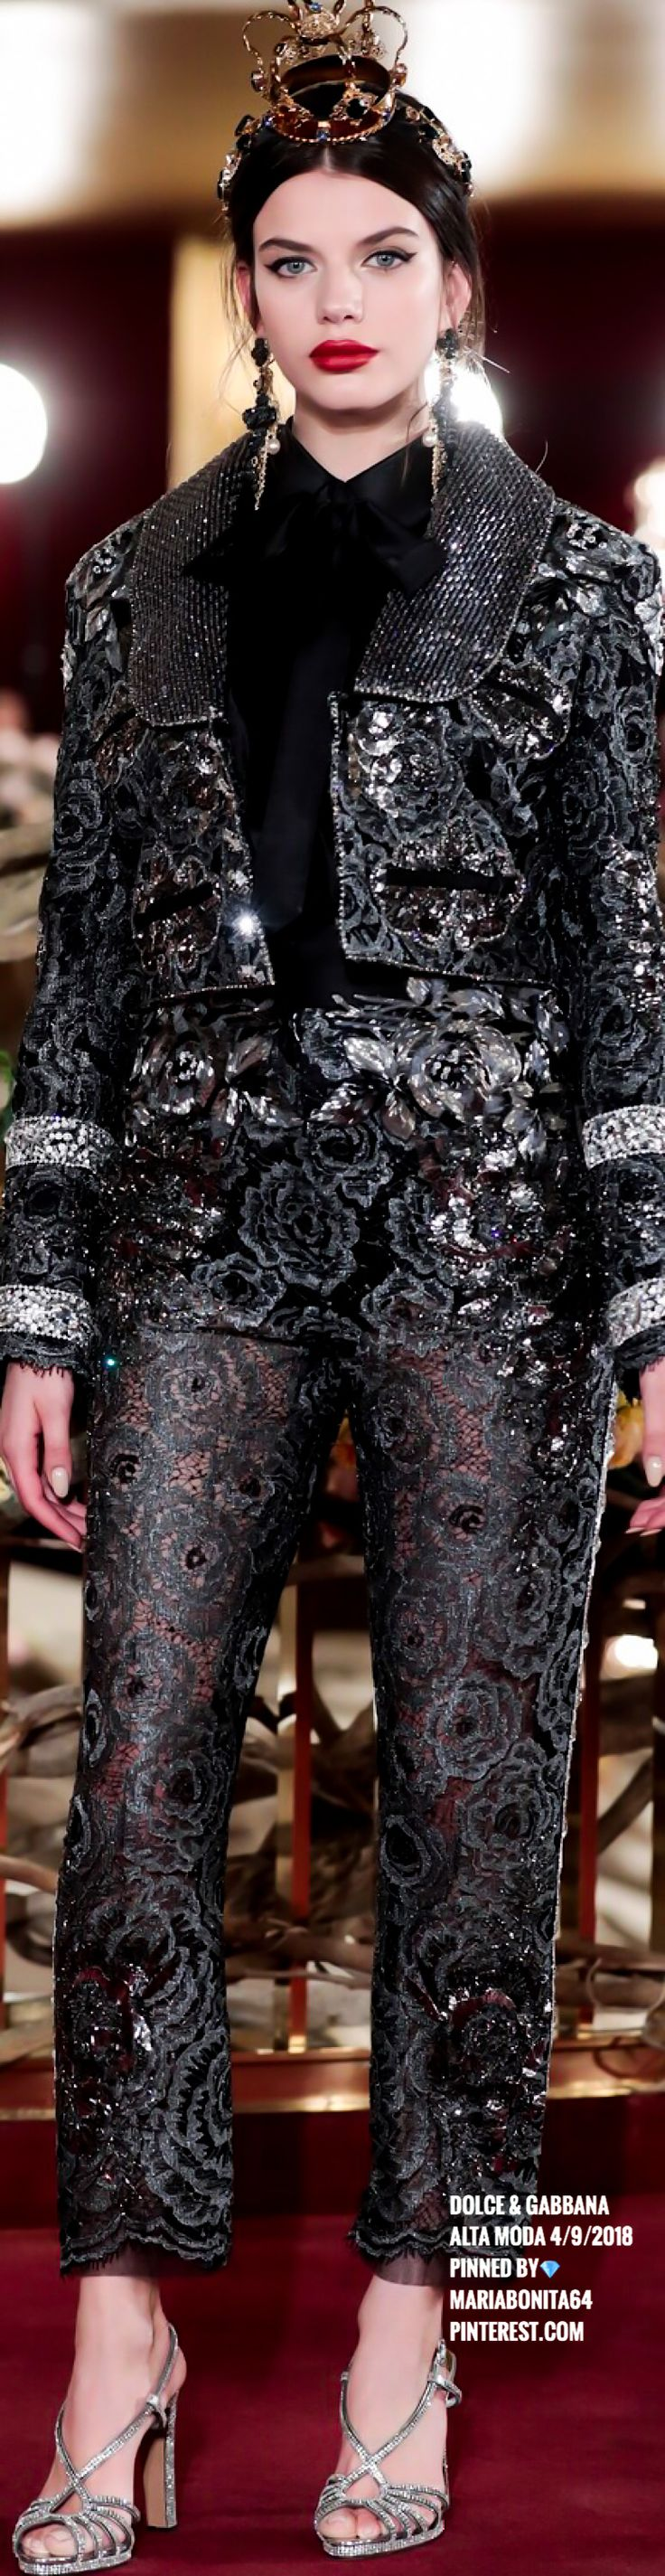 Dolce & Gabbana Alta Moda Show April 2018